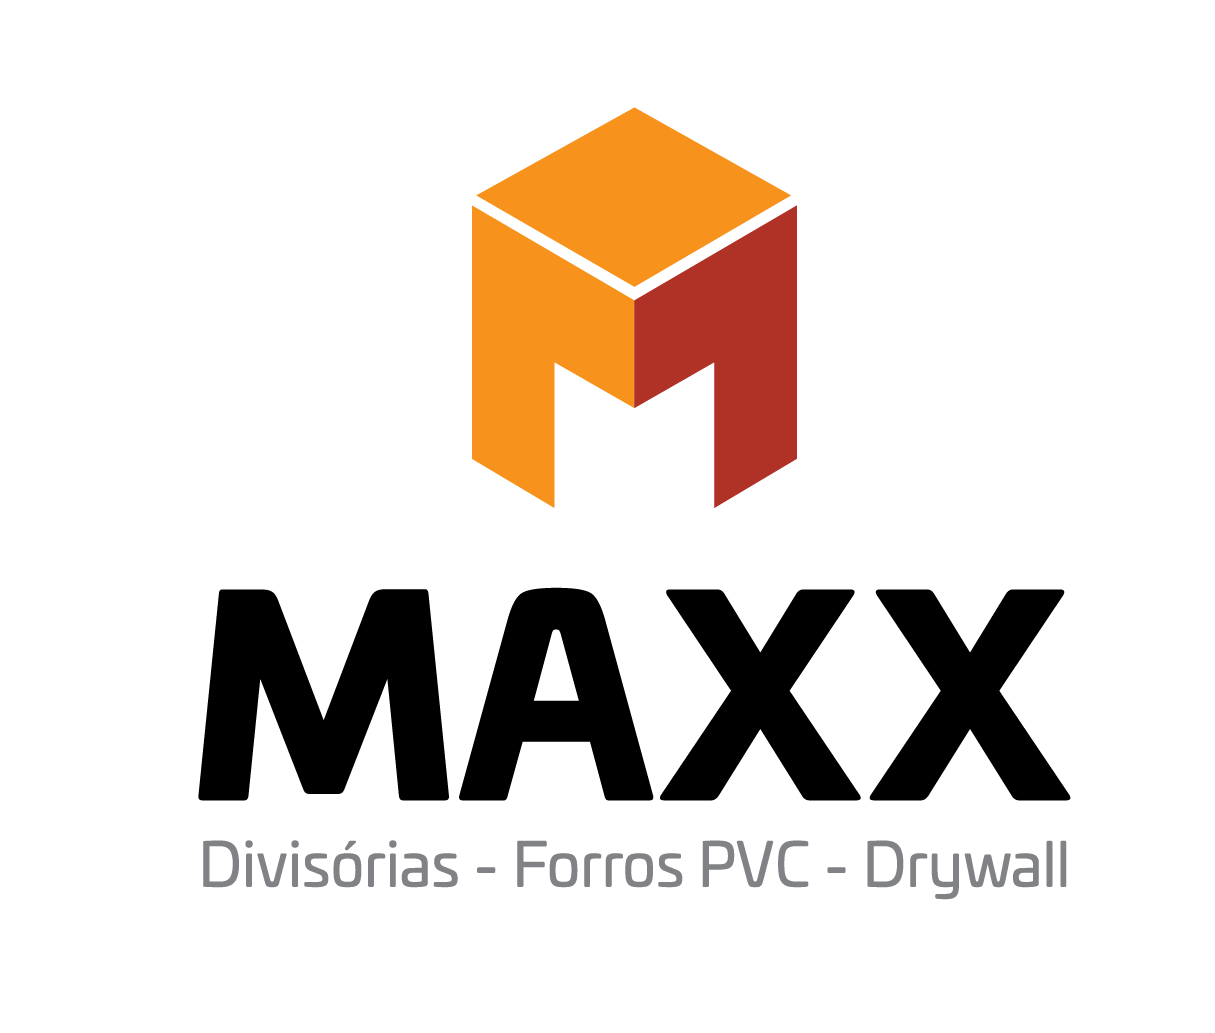 Forro de Pvc com Isolamento Térmico Dom João Nery - Forro de Pvc Branco - Maxx Forro